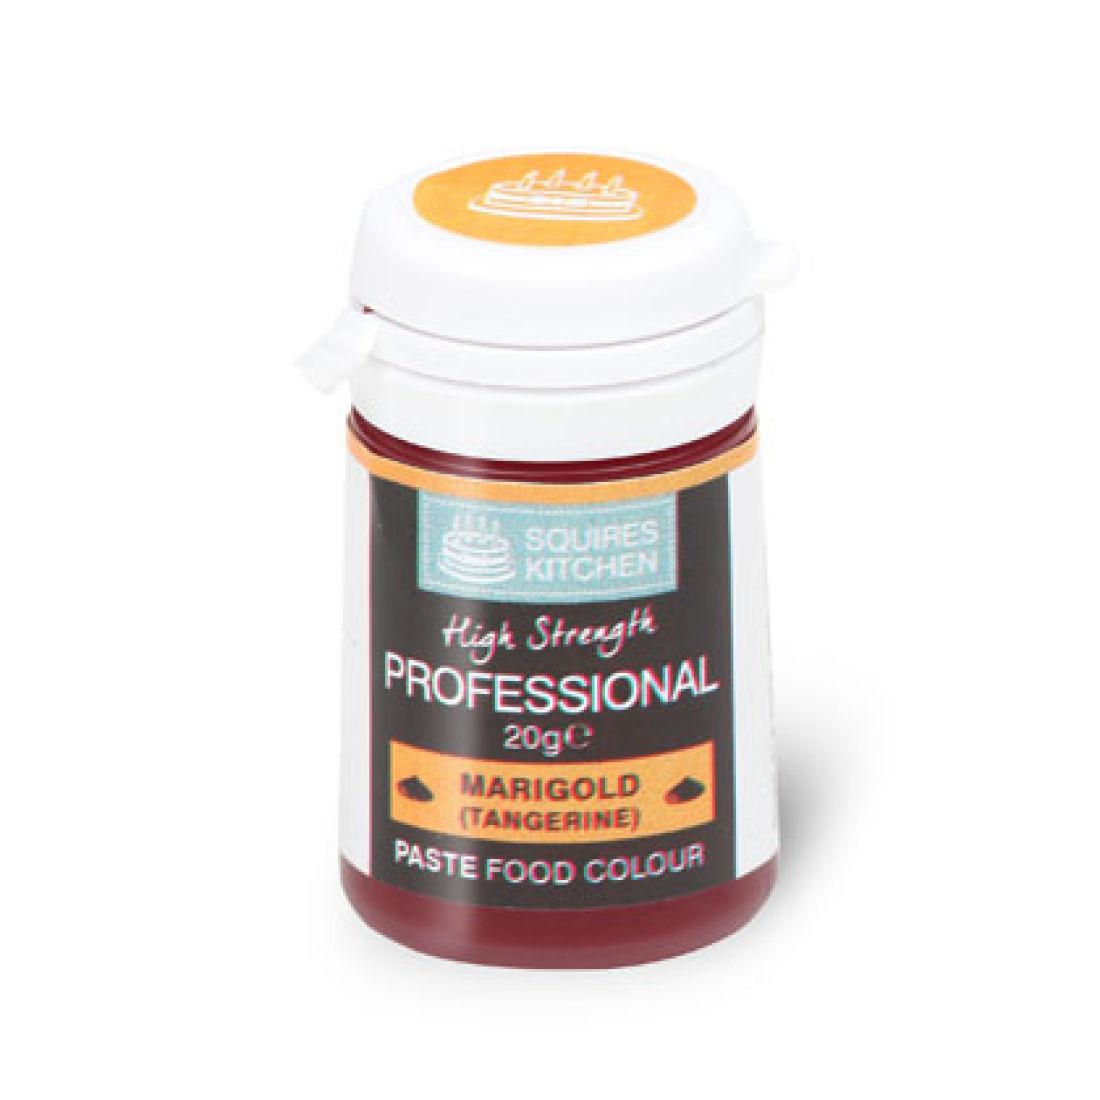 SK Professional Food Colour Paste Marigold (Tangerine) 20g | Squires ...